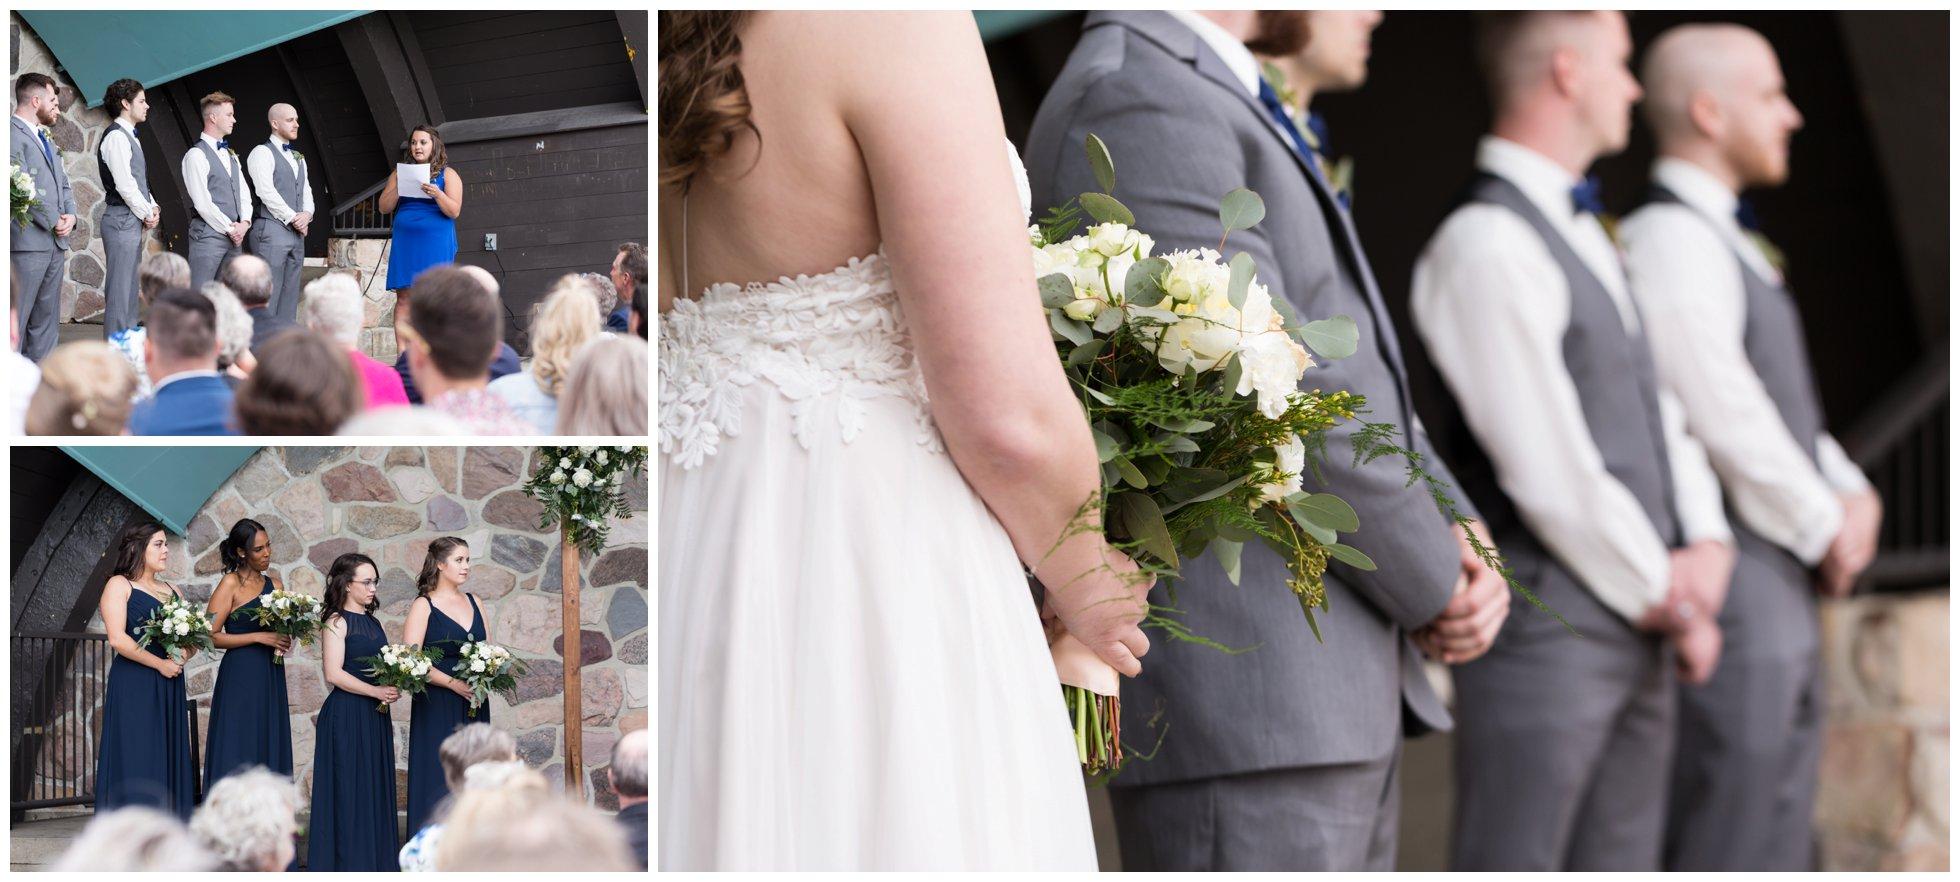 Emily and Royden Edmonton Wedding (Life by Selena Photography)_0005.jpg